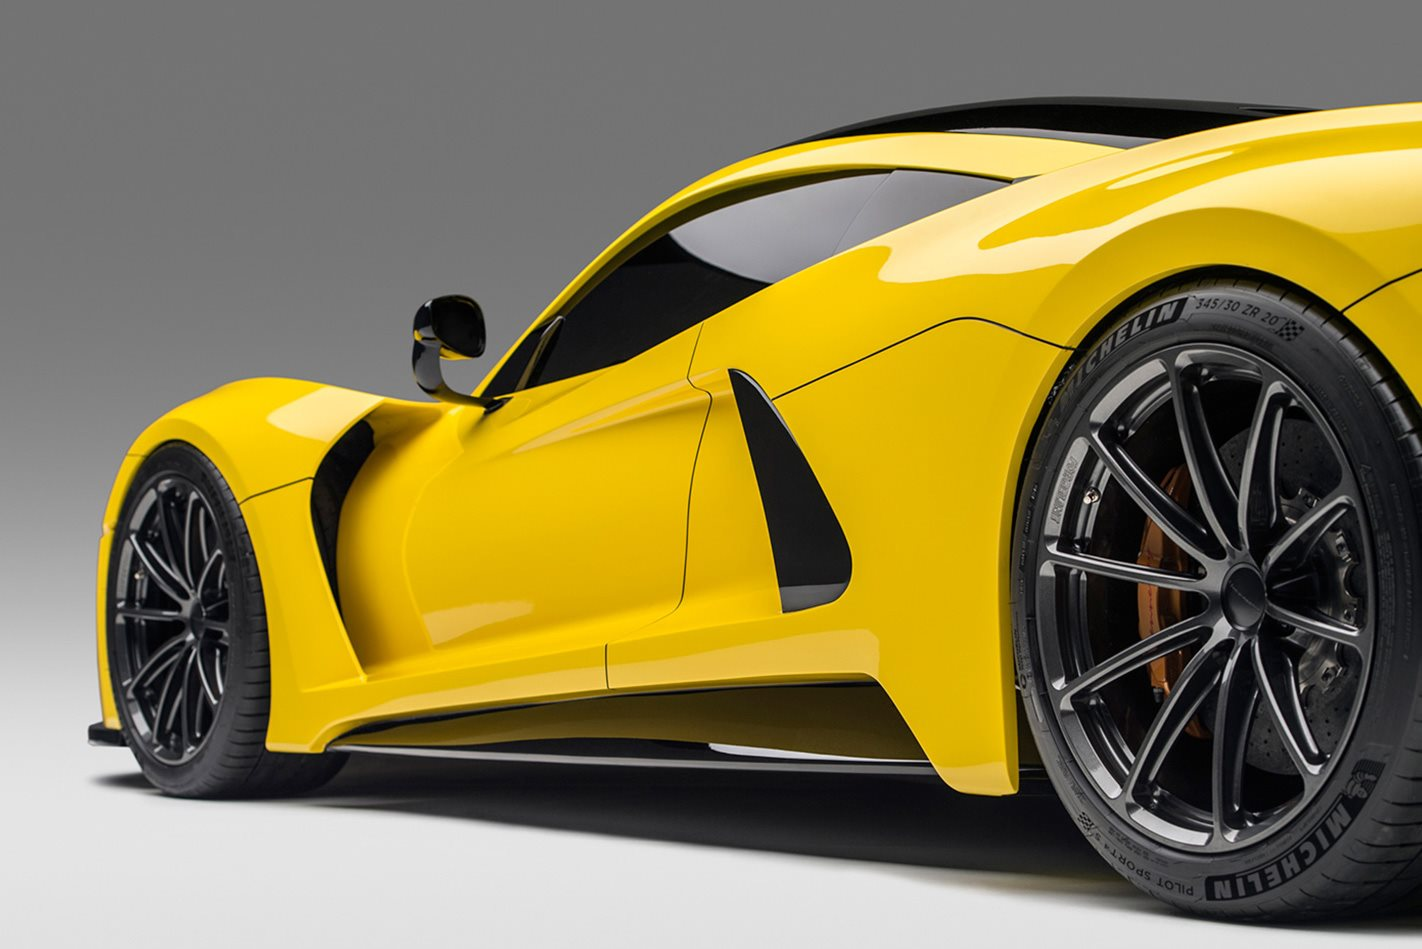 Hennessey Venom F5 exterior